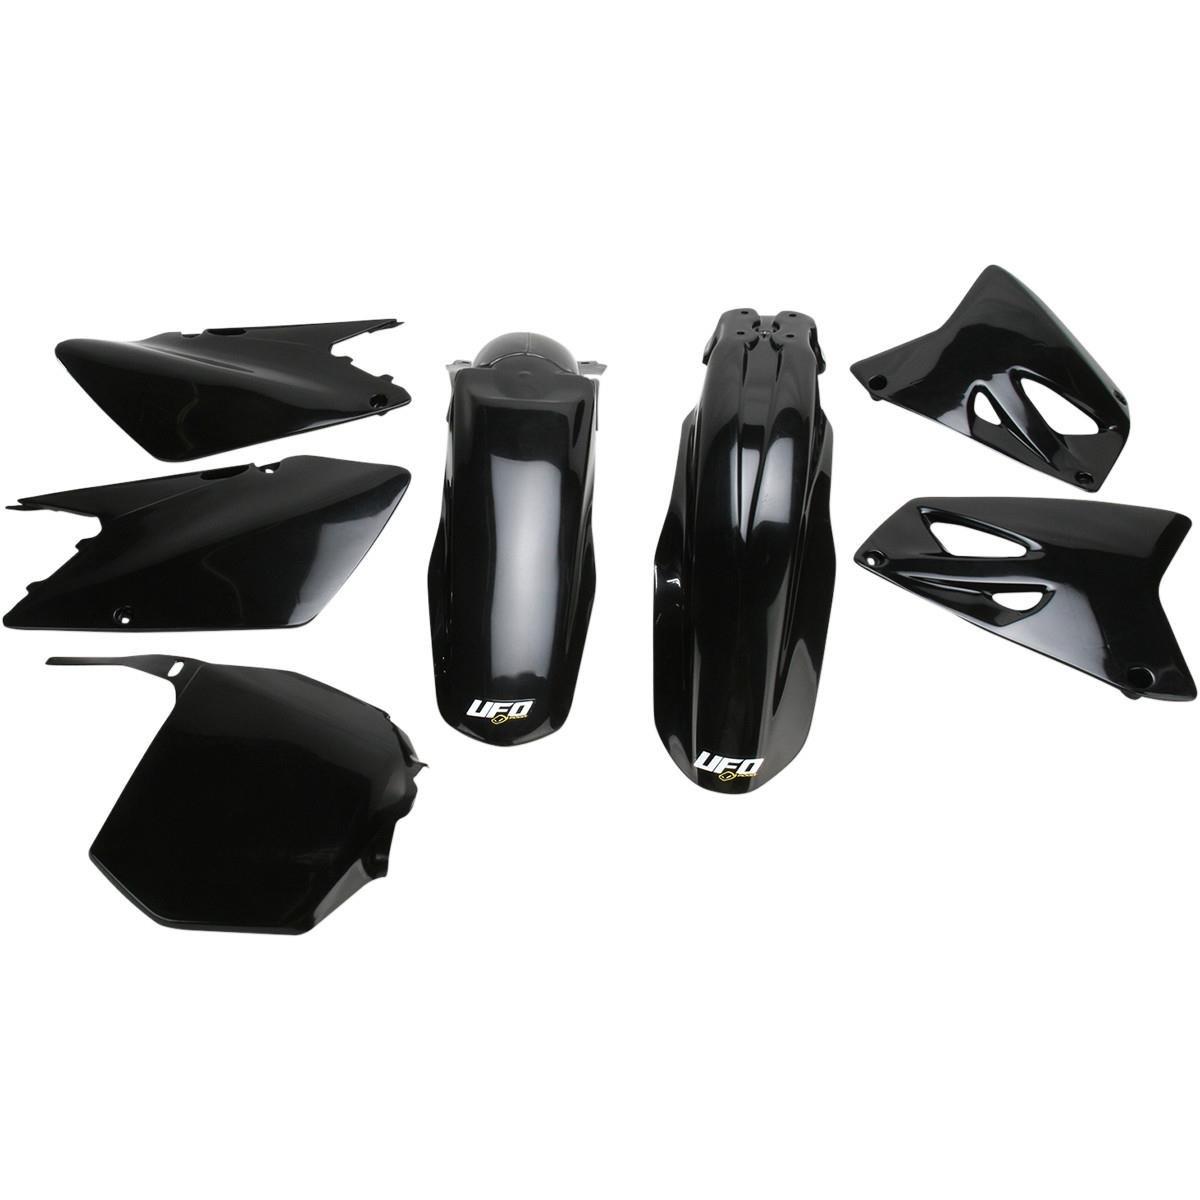 UFO SUKIT402 001 Complete Body Kit BODY KIT RM125 250 03 6 BLACK